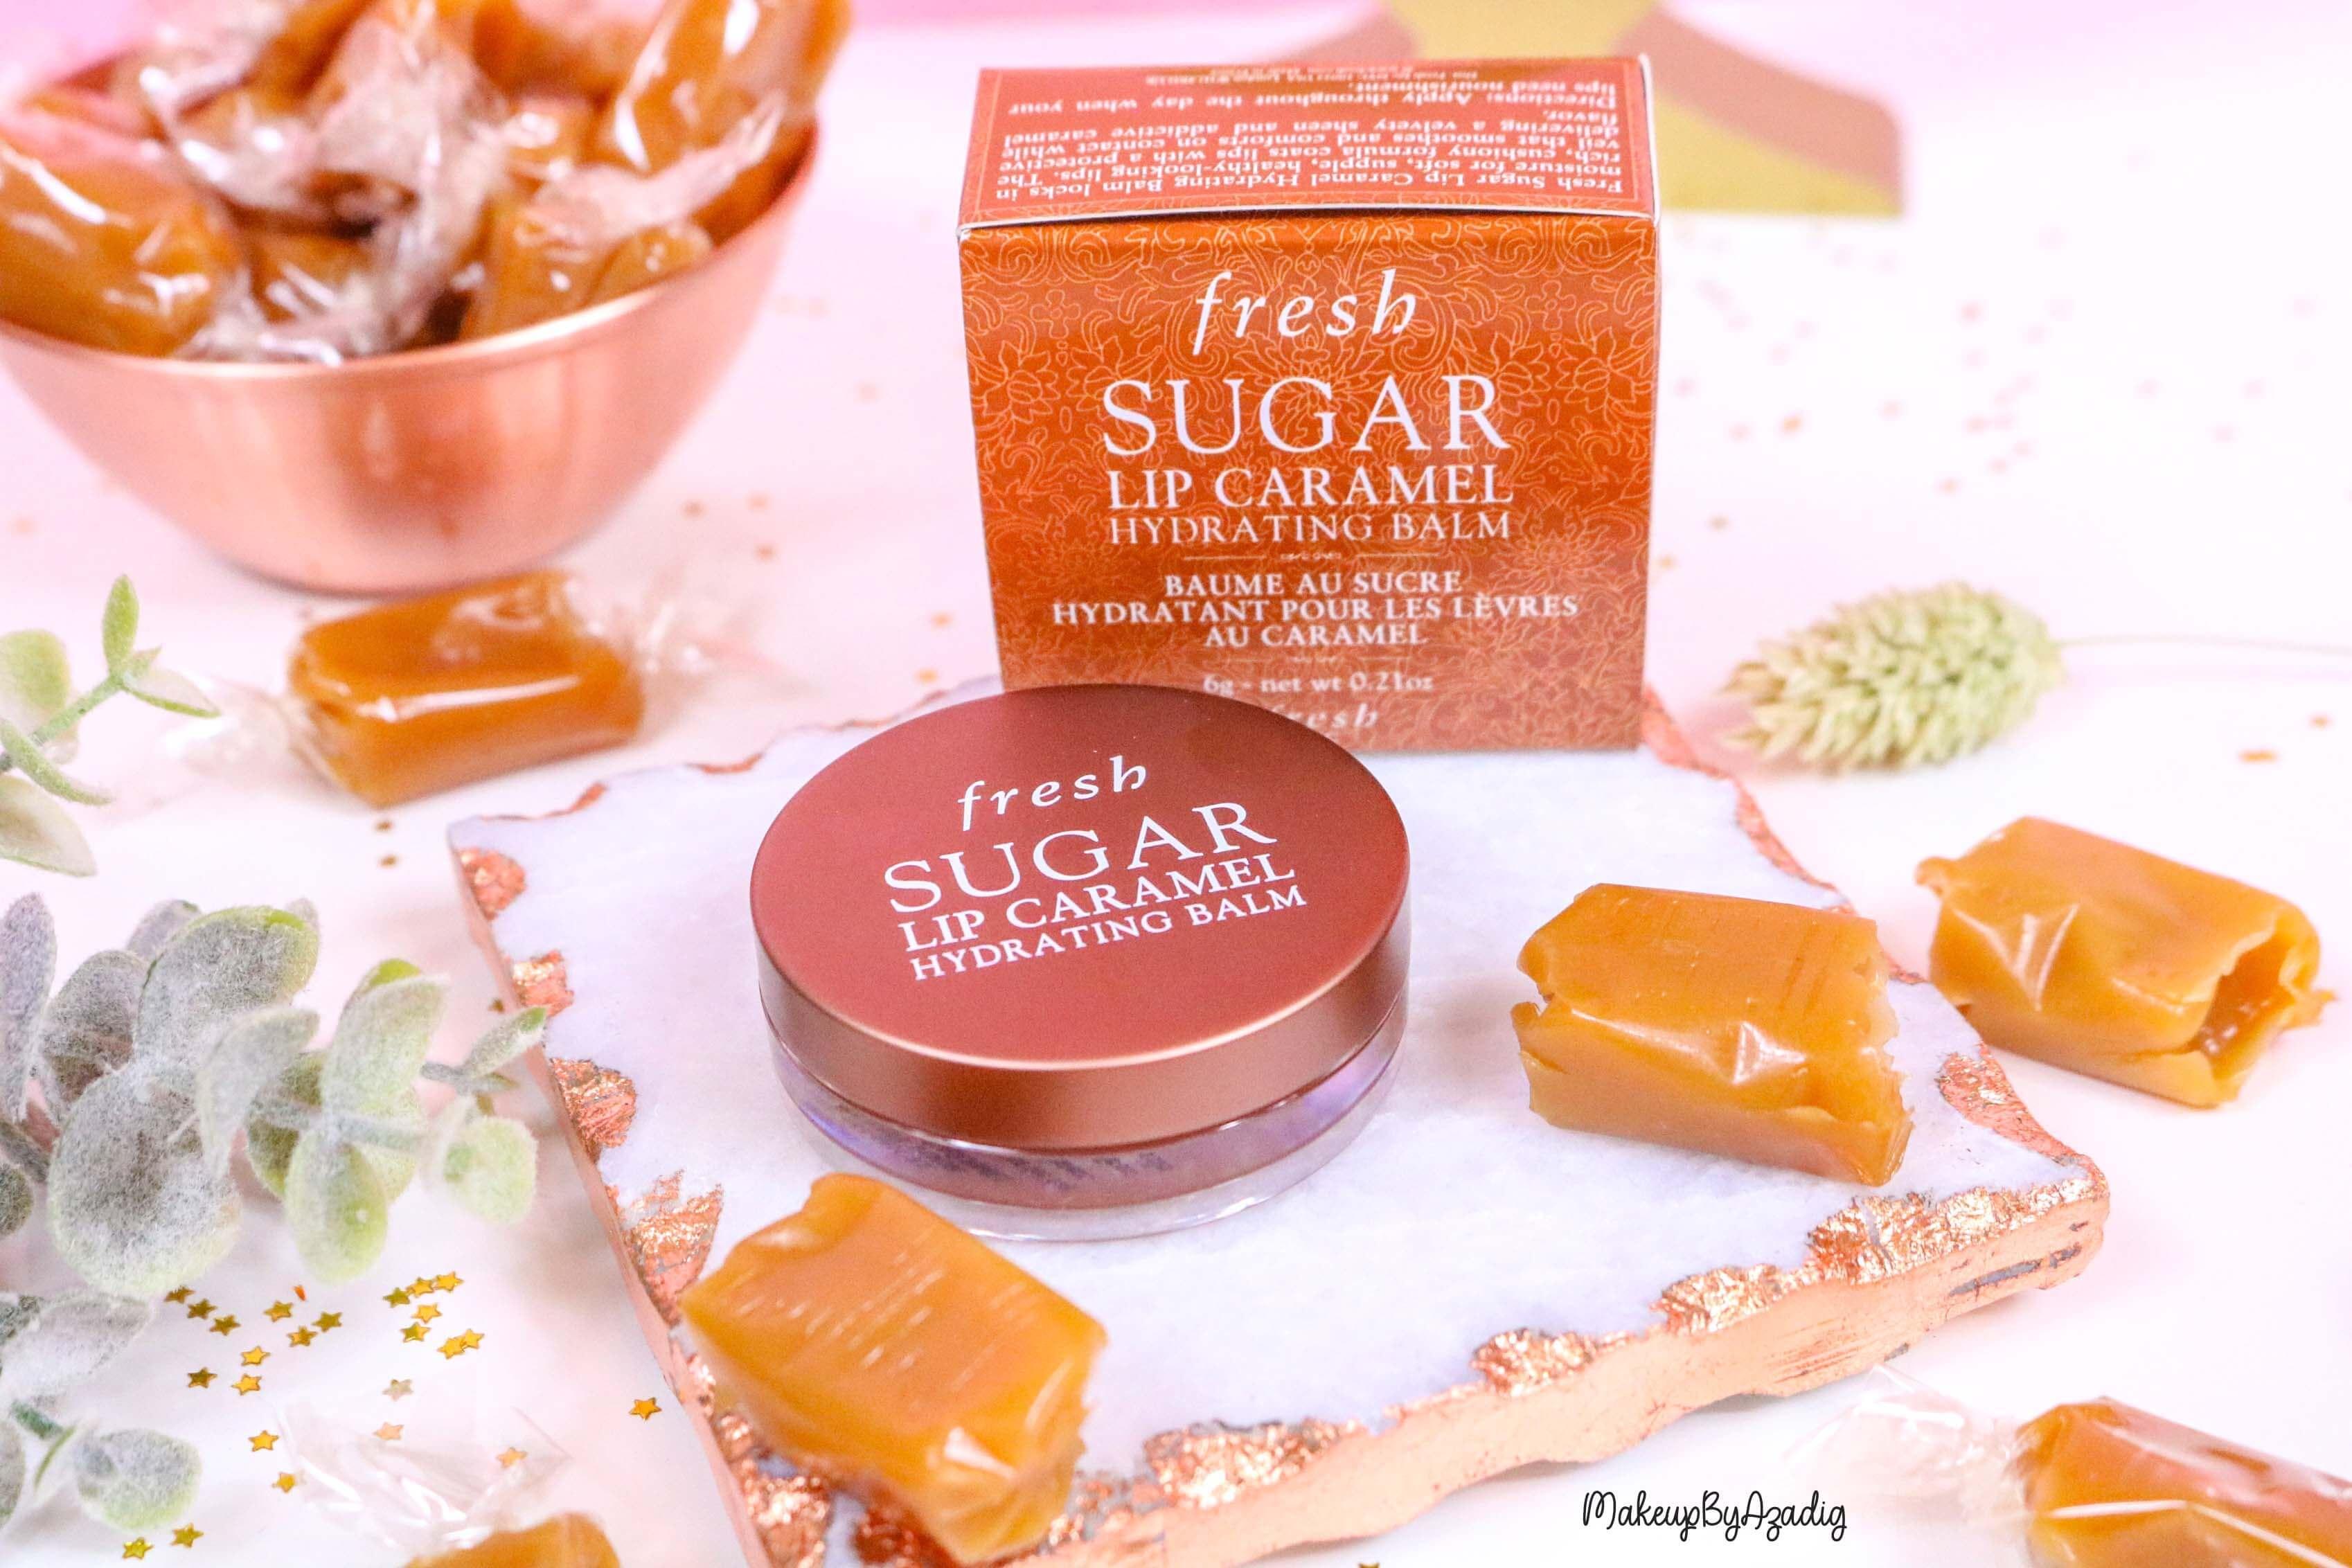 revue-baume-sucre-fresh-beauty-skincare-caramel-sugar-lip-caramel-sephora-makeupbyazadig-avis-prix-balm-hydratant